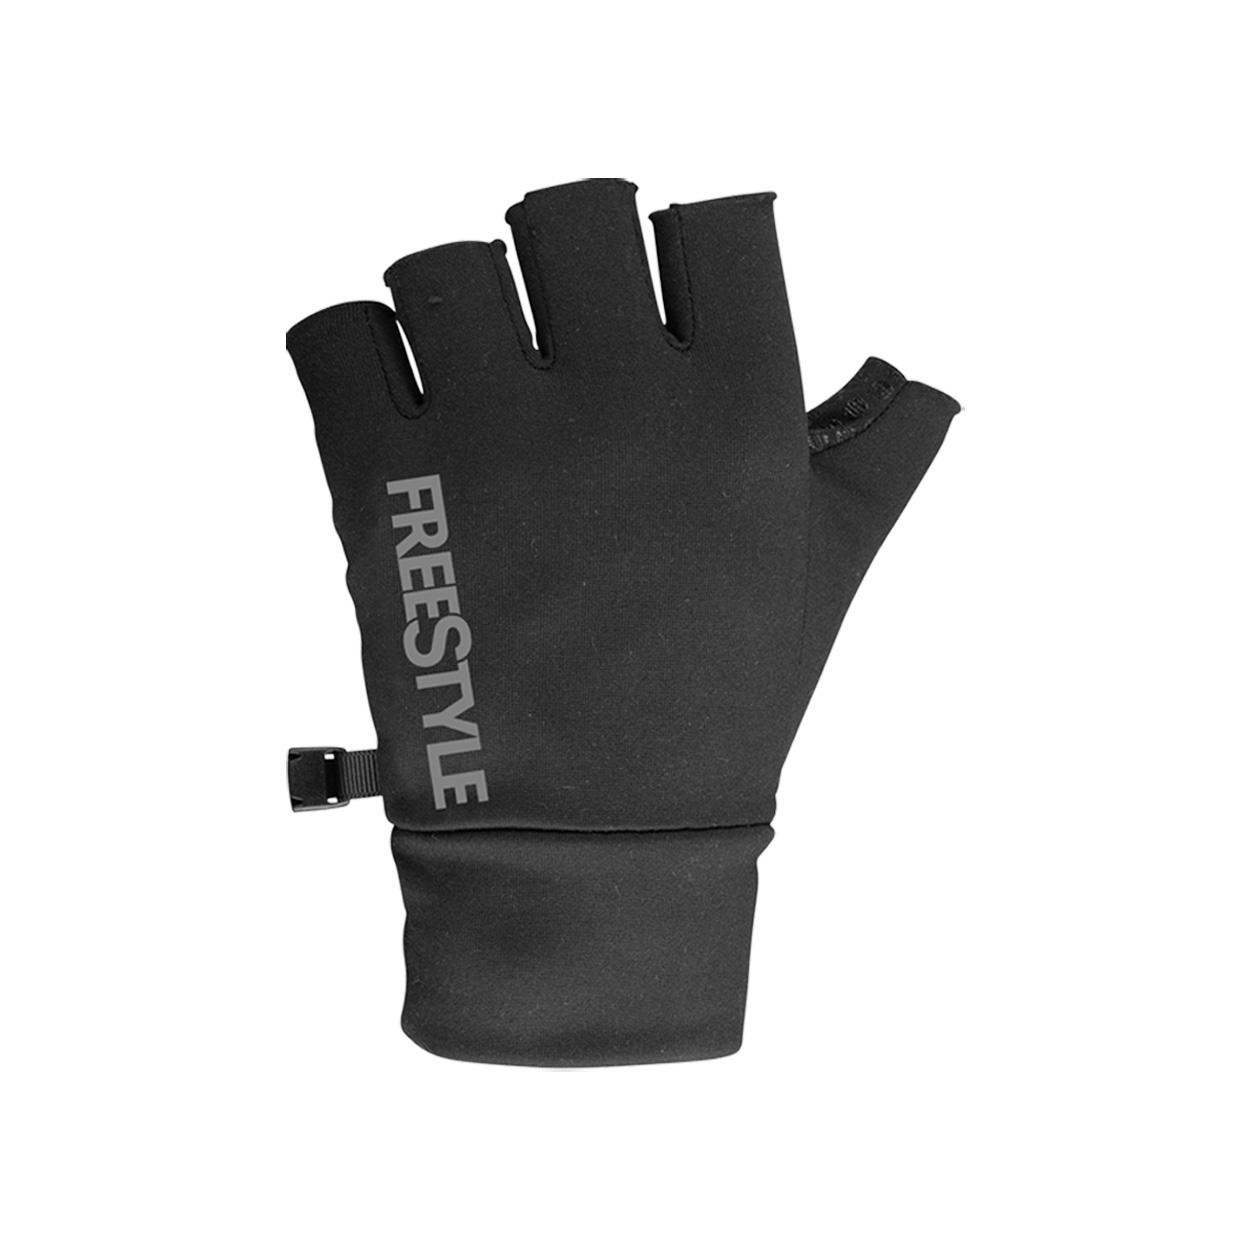 Shop Image - Fingerless Glove 01